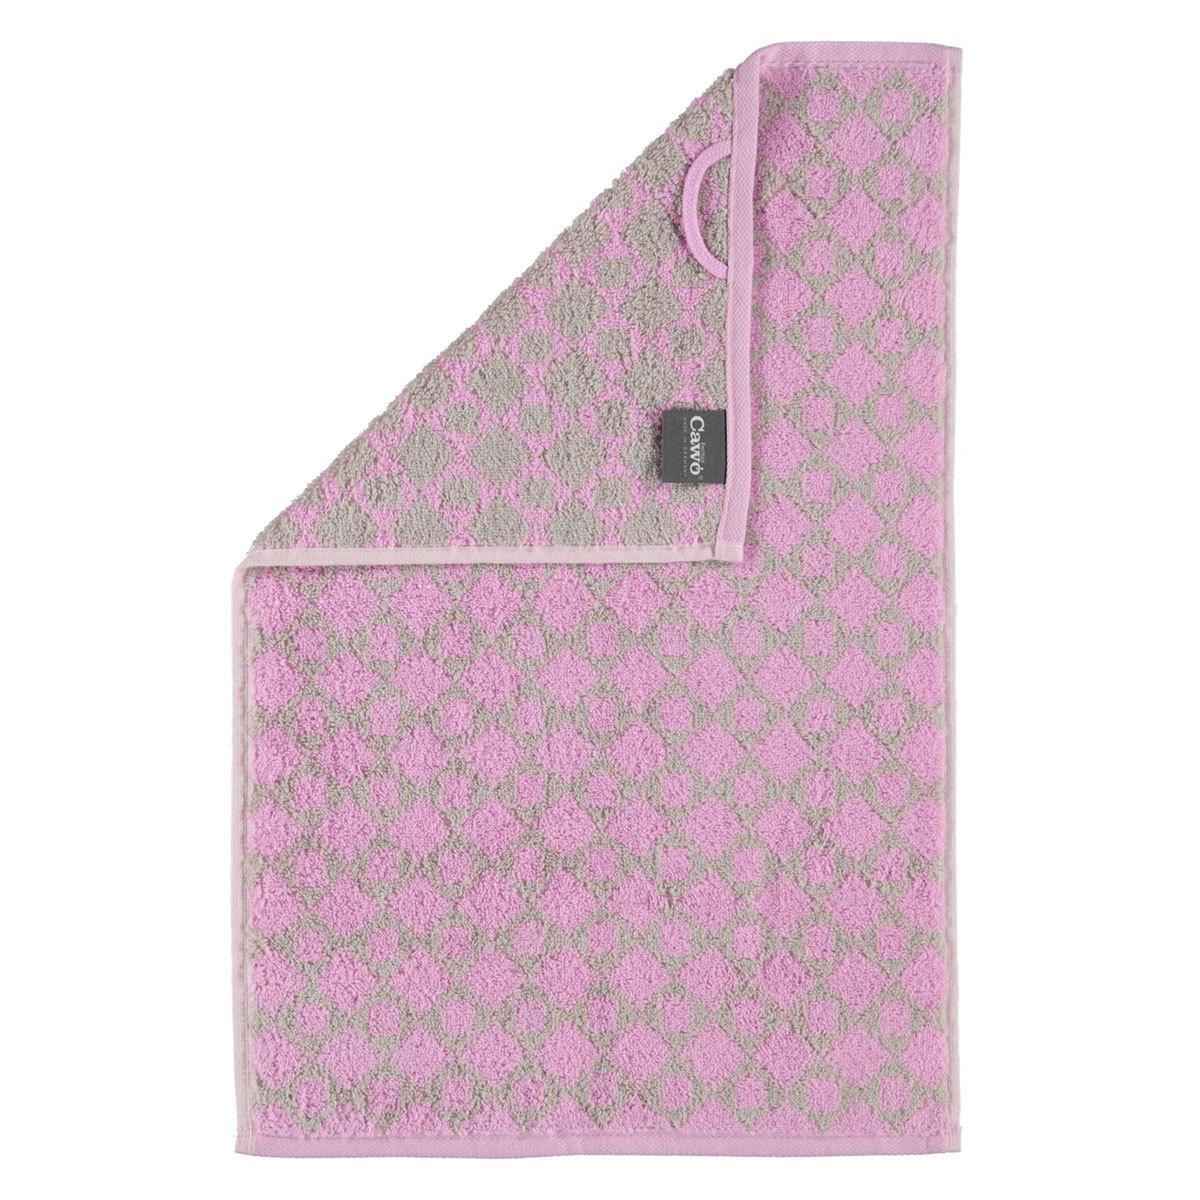 caw handt cher 585 diamant frozen pink g nstig online kaufen bei bettwaren shop. Black Bedroom Furniture Sets. Home Design Ideas